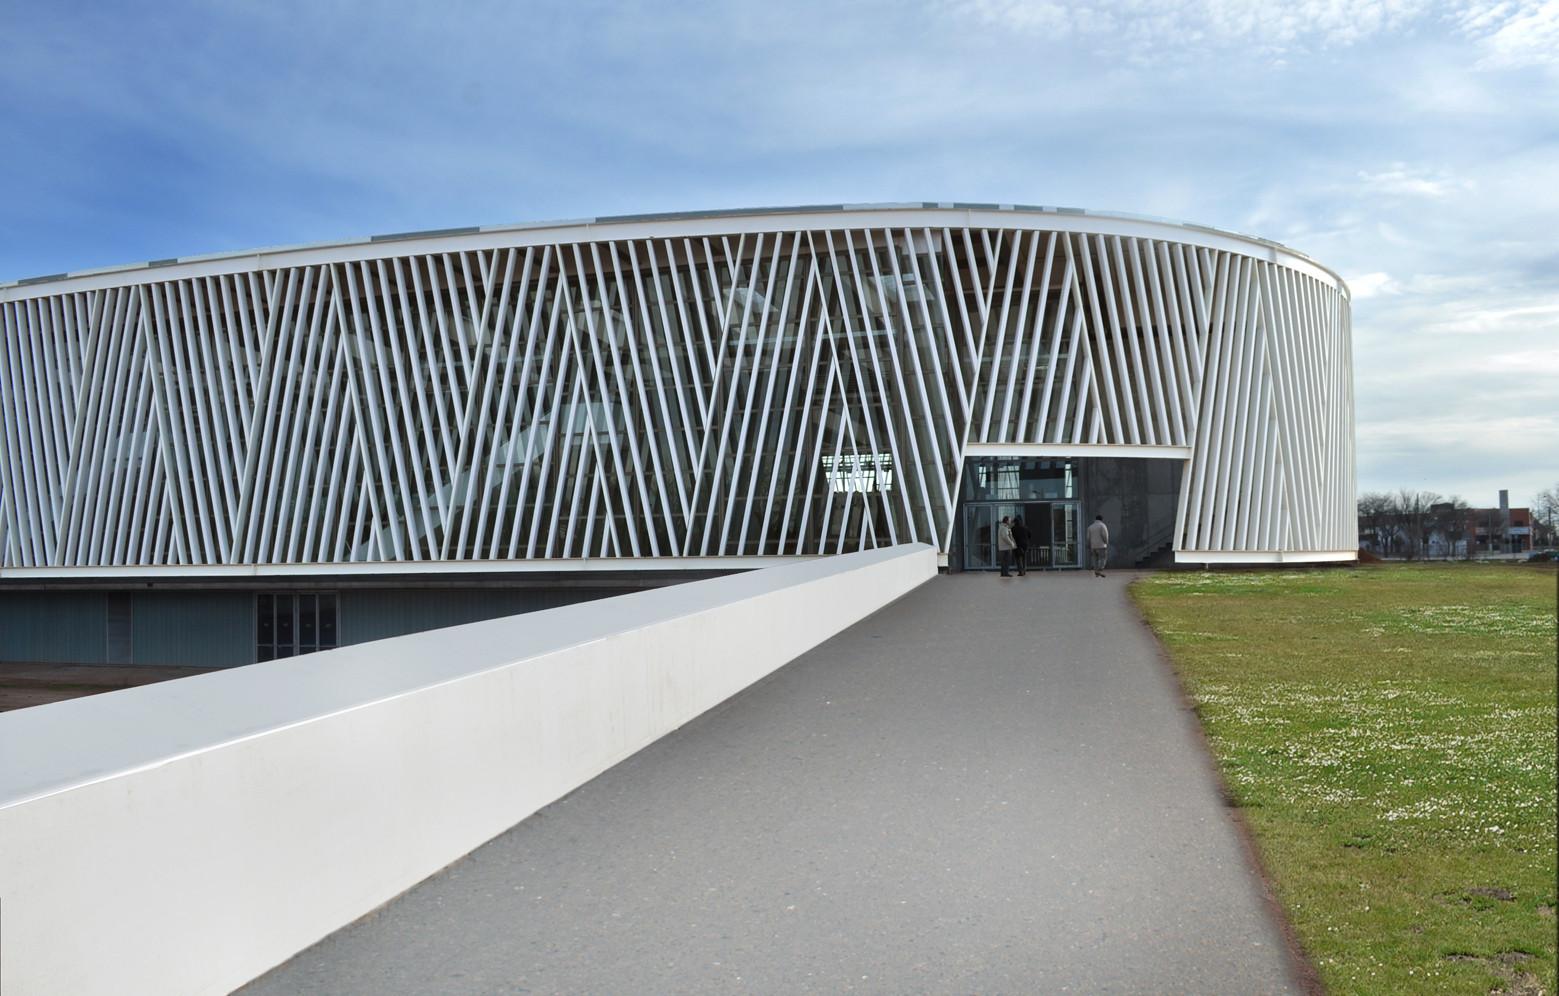 Centro Deportivo en Alcazar de San Juan / Rojo/Fernandez-Shaw , Courtesy of Begoña Fernández-Shaw